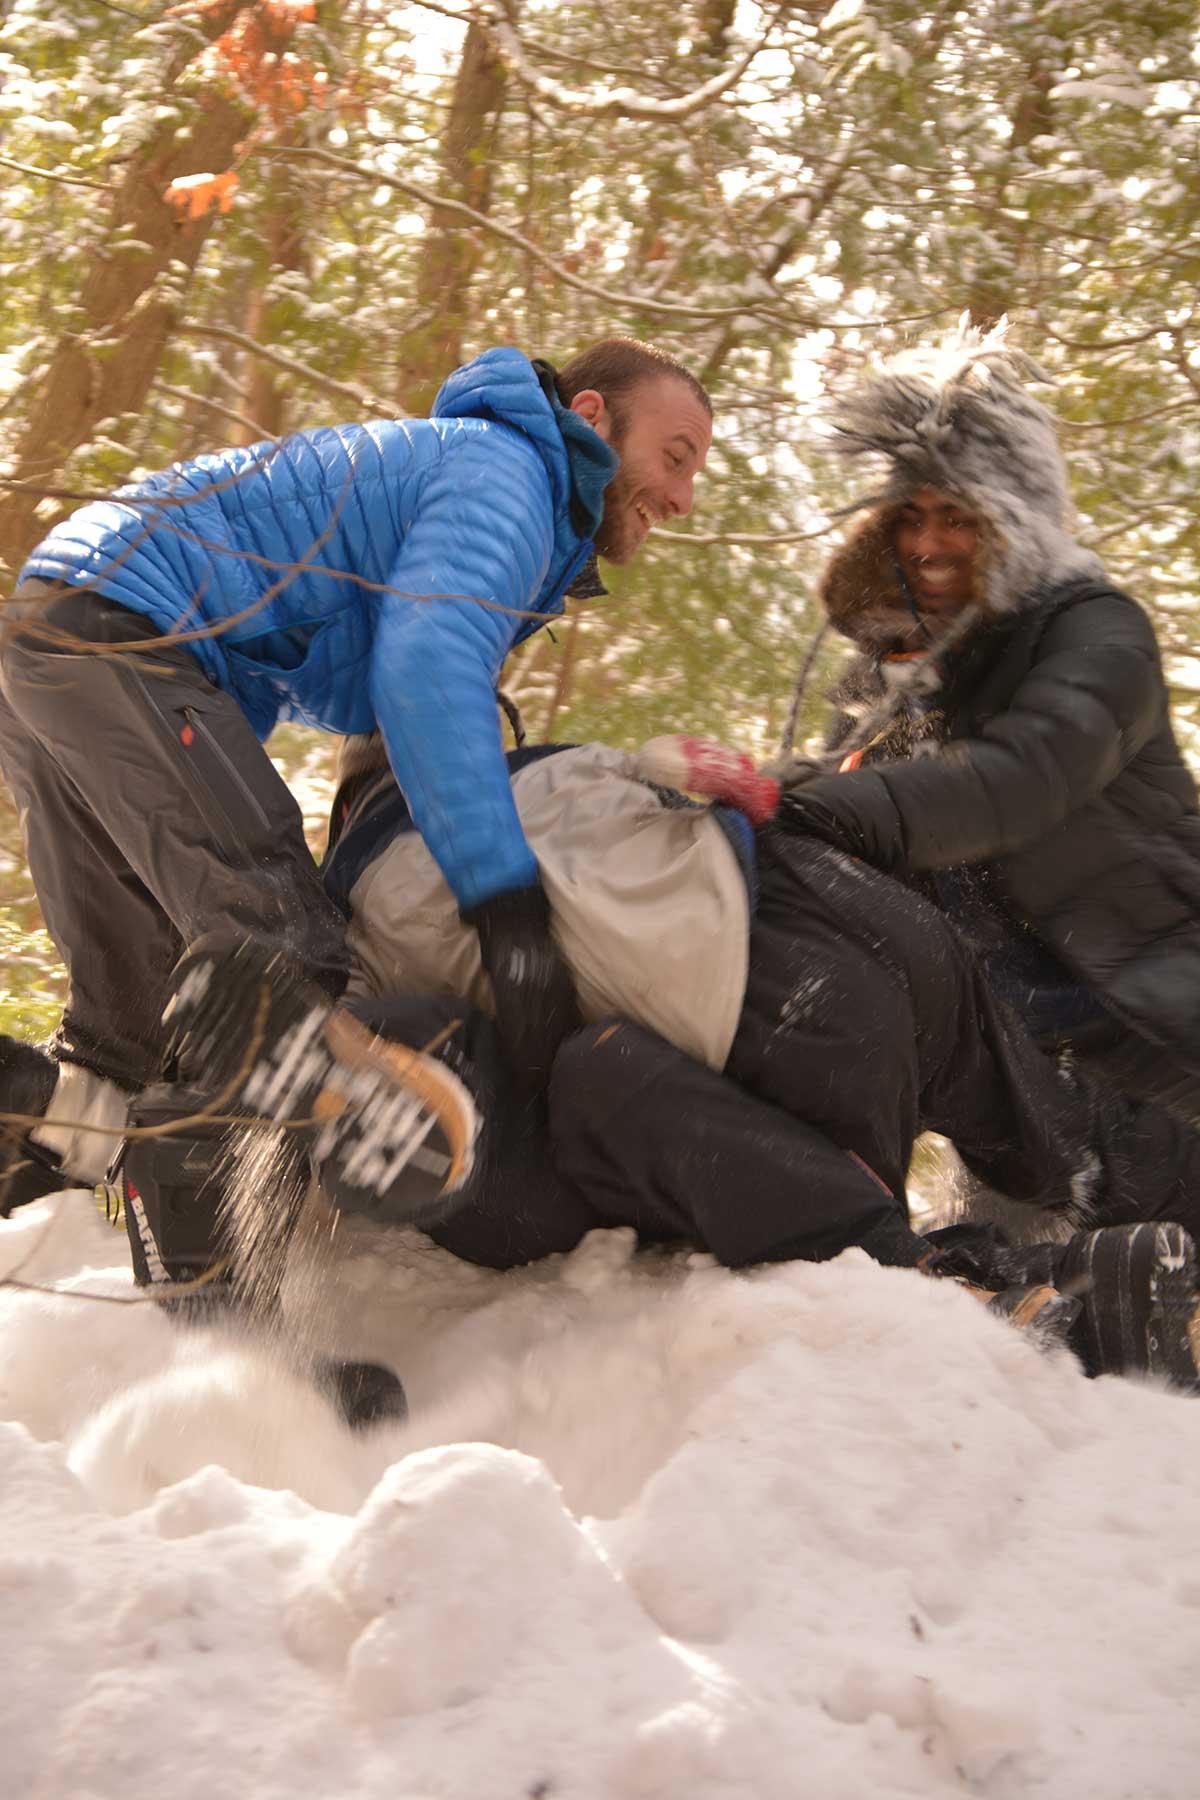 Winter-Camping-Feb-17-19,-2015-178.jpg